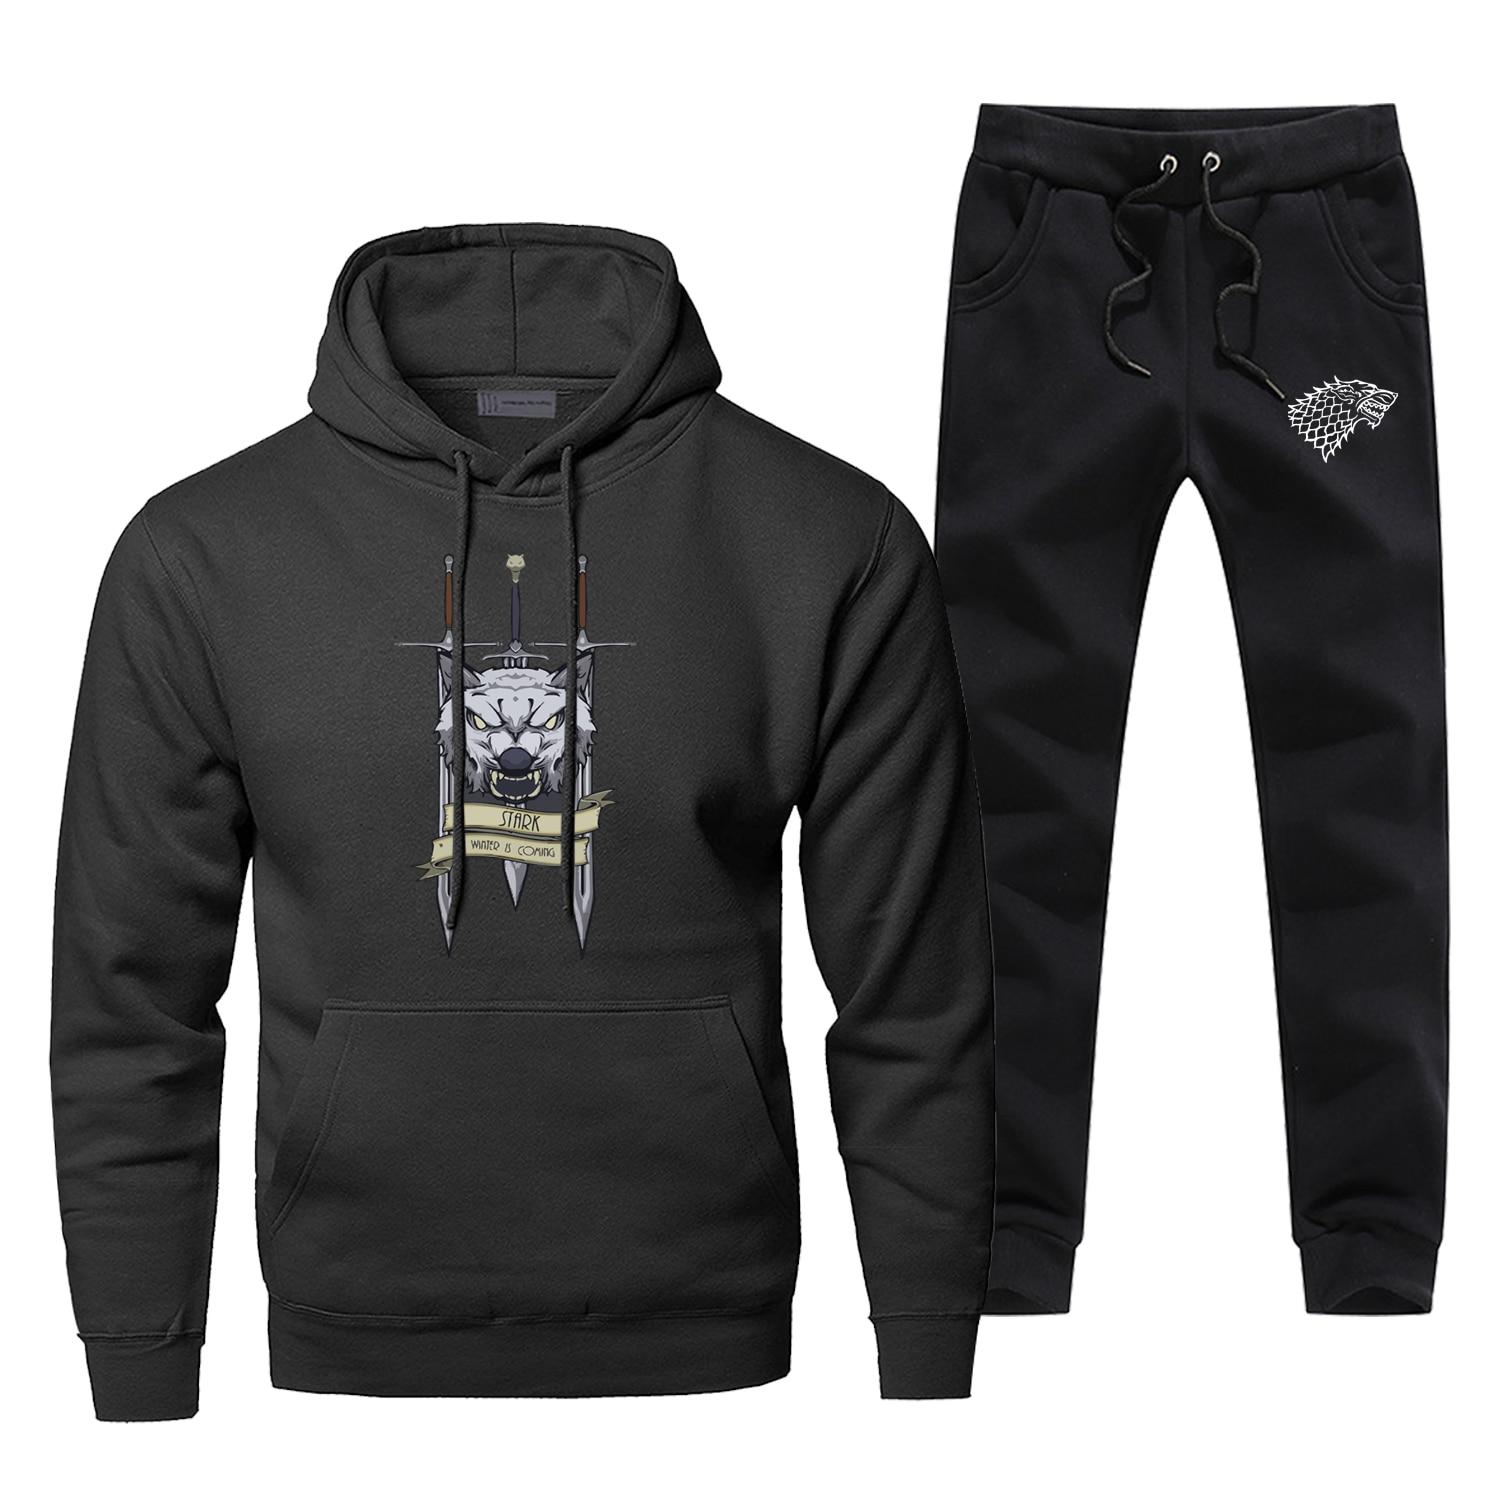 Fashion Game Of Thrones House Stark Print Sweatshirt Hoodies Pants 2pcs Sets Men Fleece Sportswear Tracksuit Harajuku Streetwear